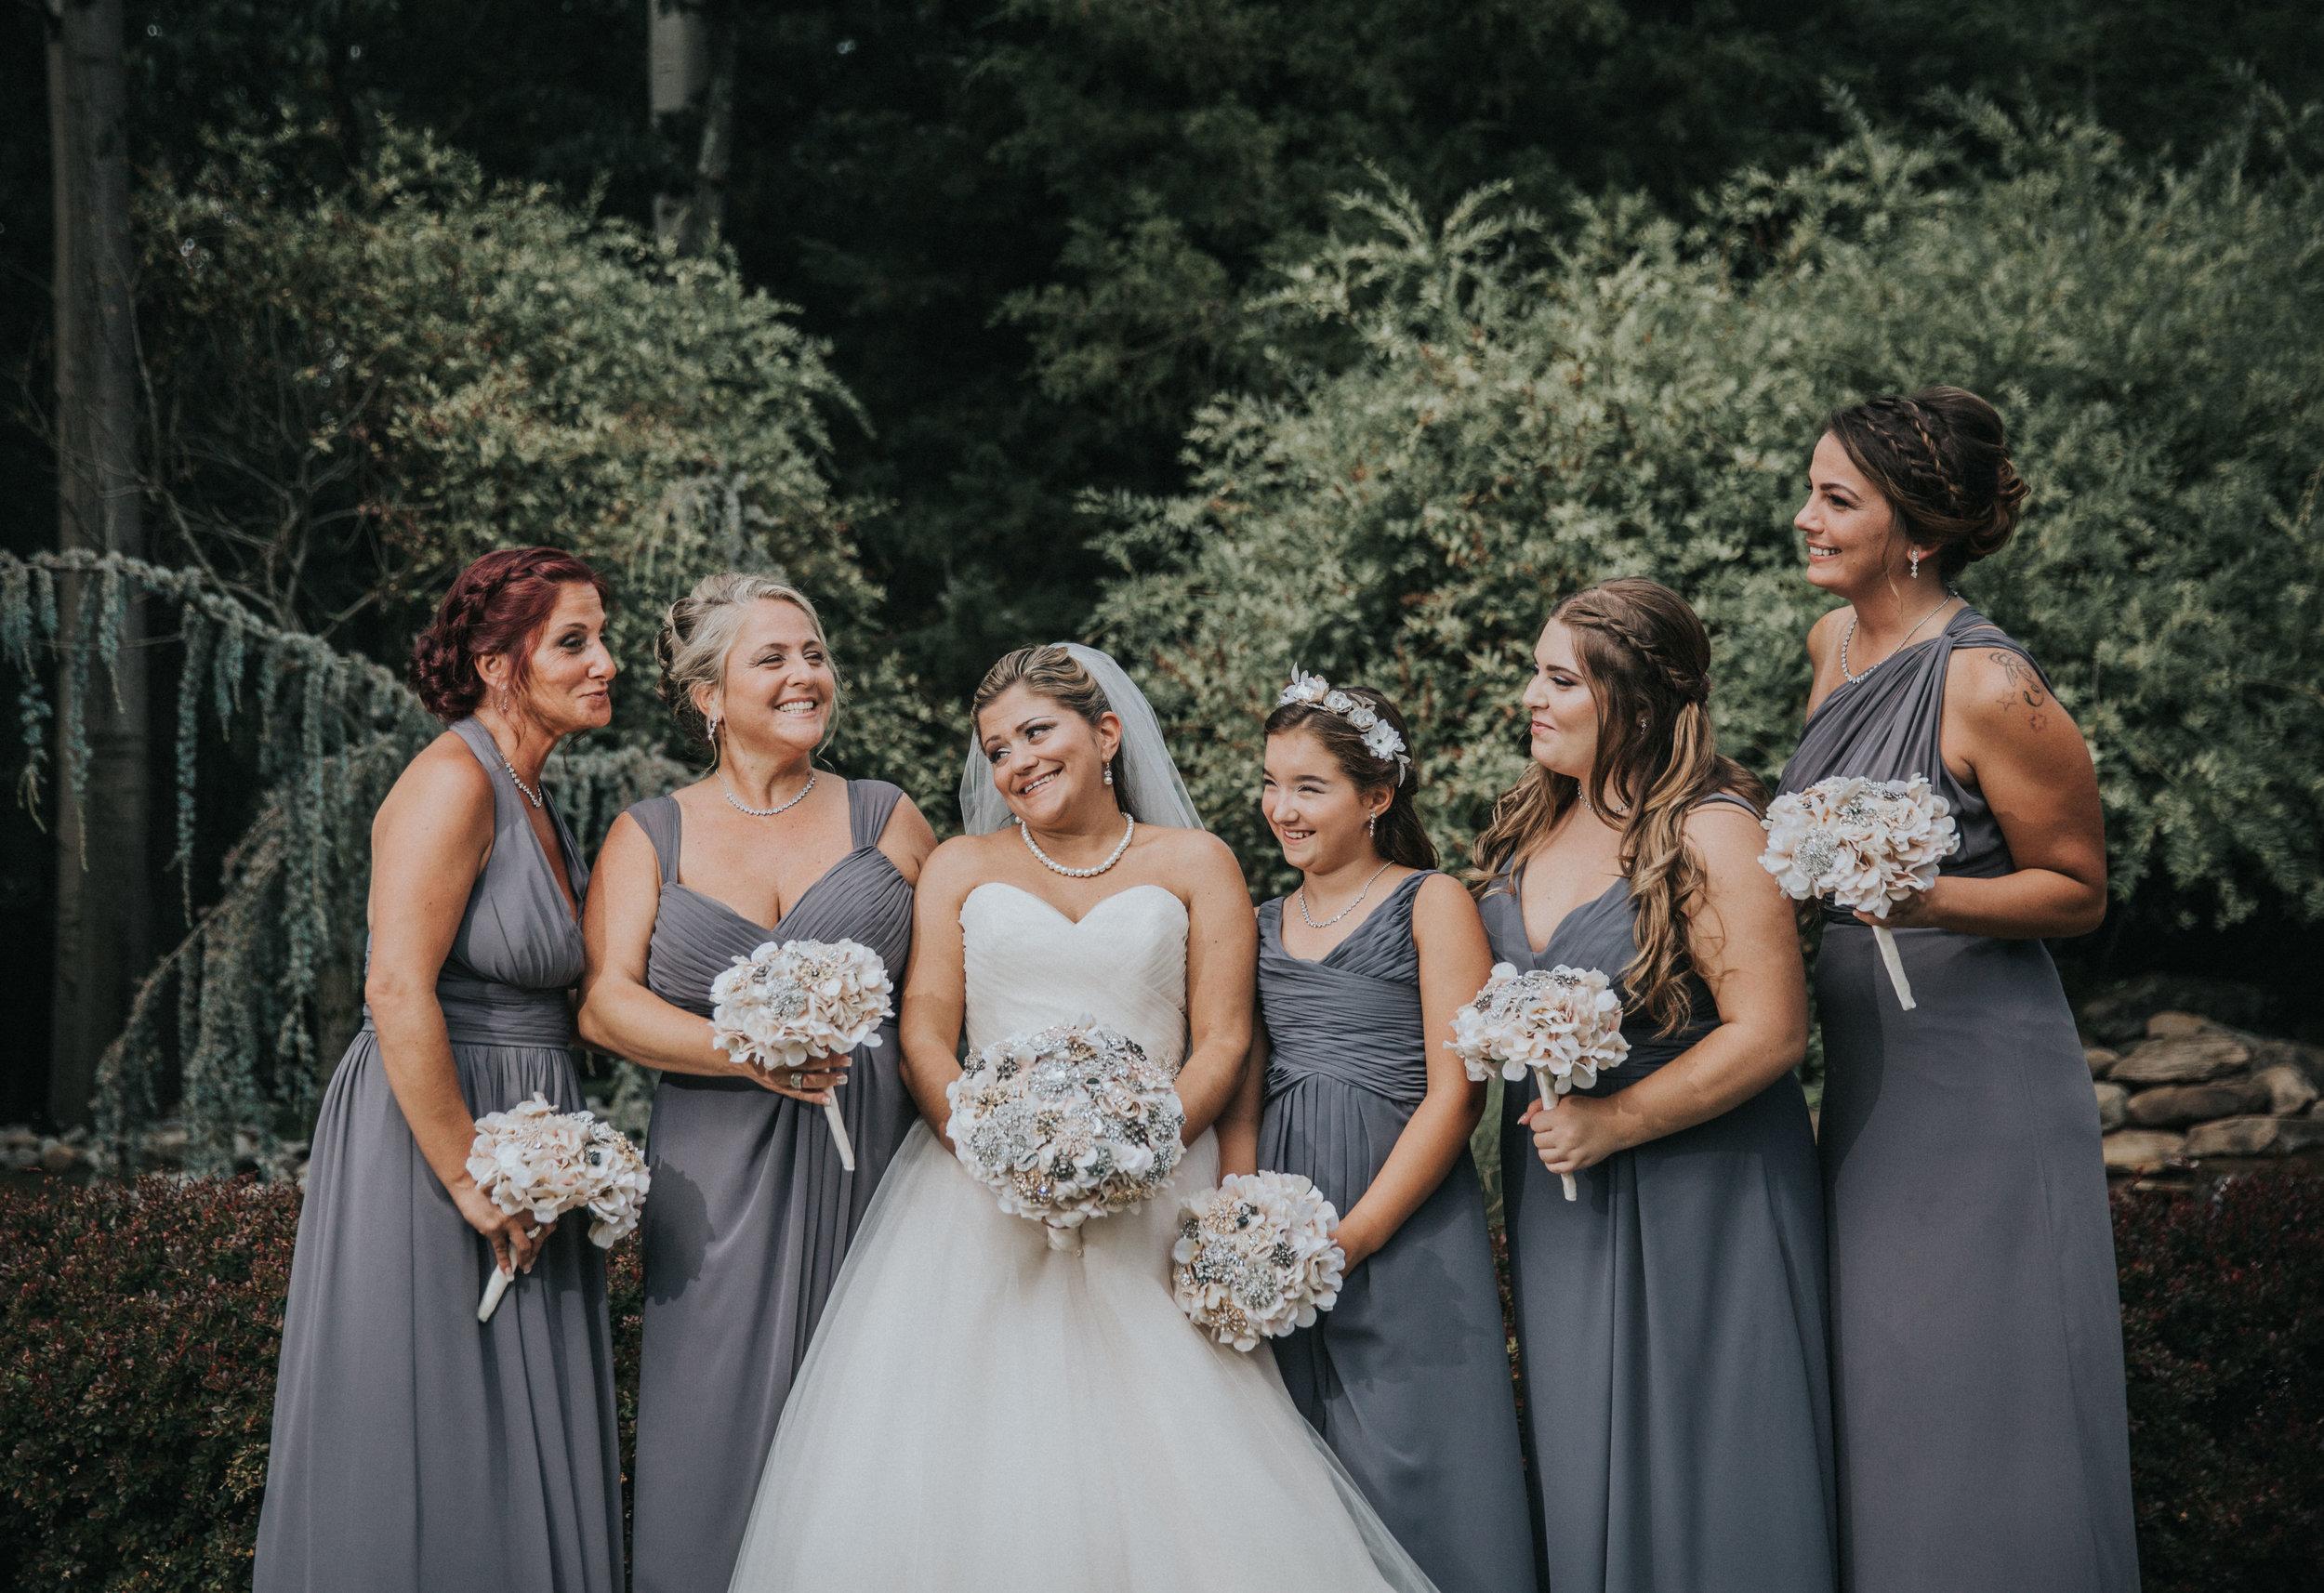 NewJersey_Wedding_Photography_Brigalias_Bridal_Party_Tara&Pete-57.jpg